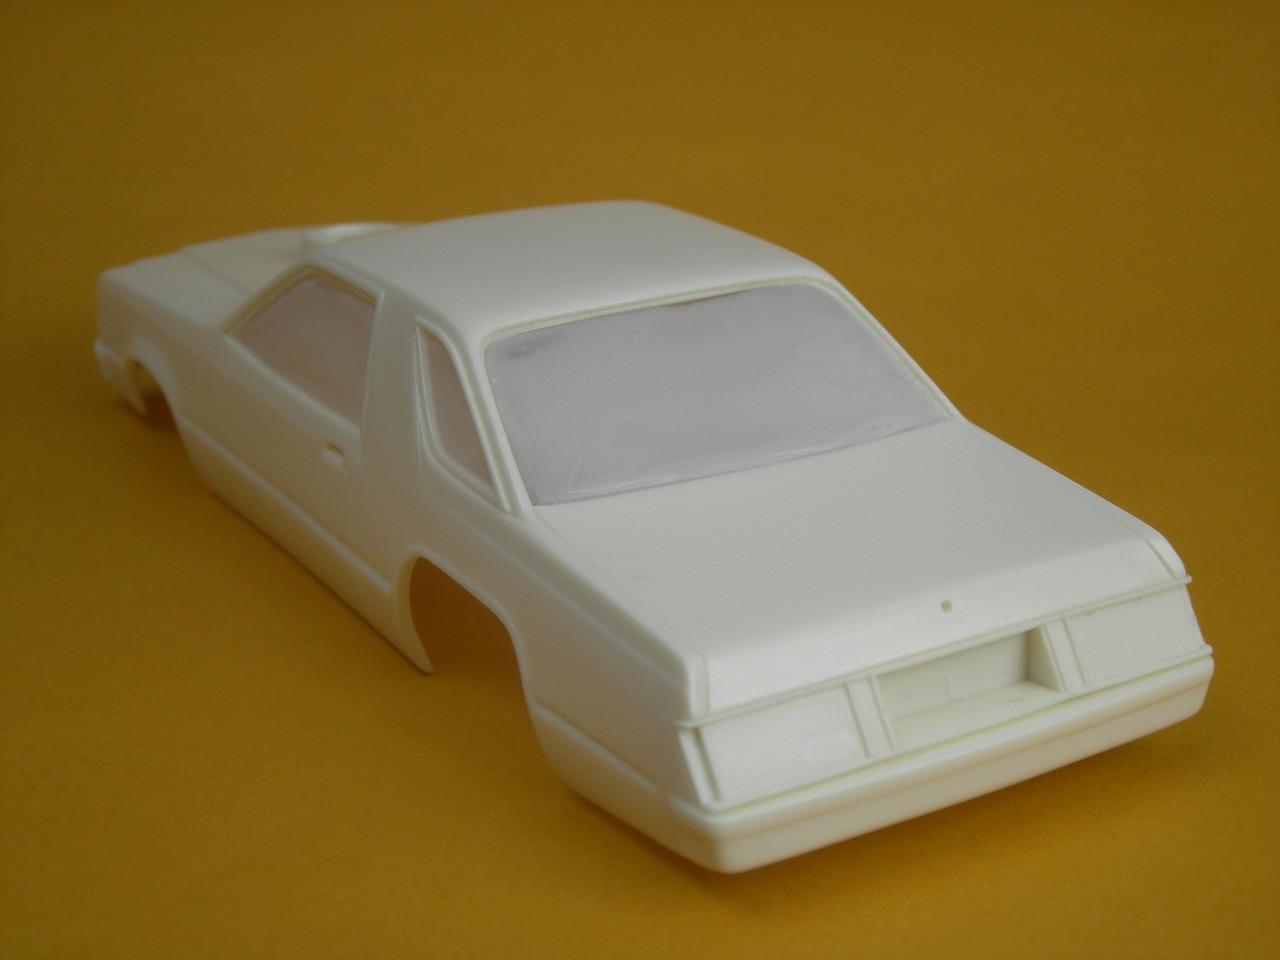 Fairmont Pro Stock Drag Racing Body Kit w/ Shipping  1/25